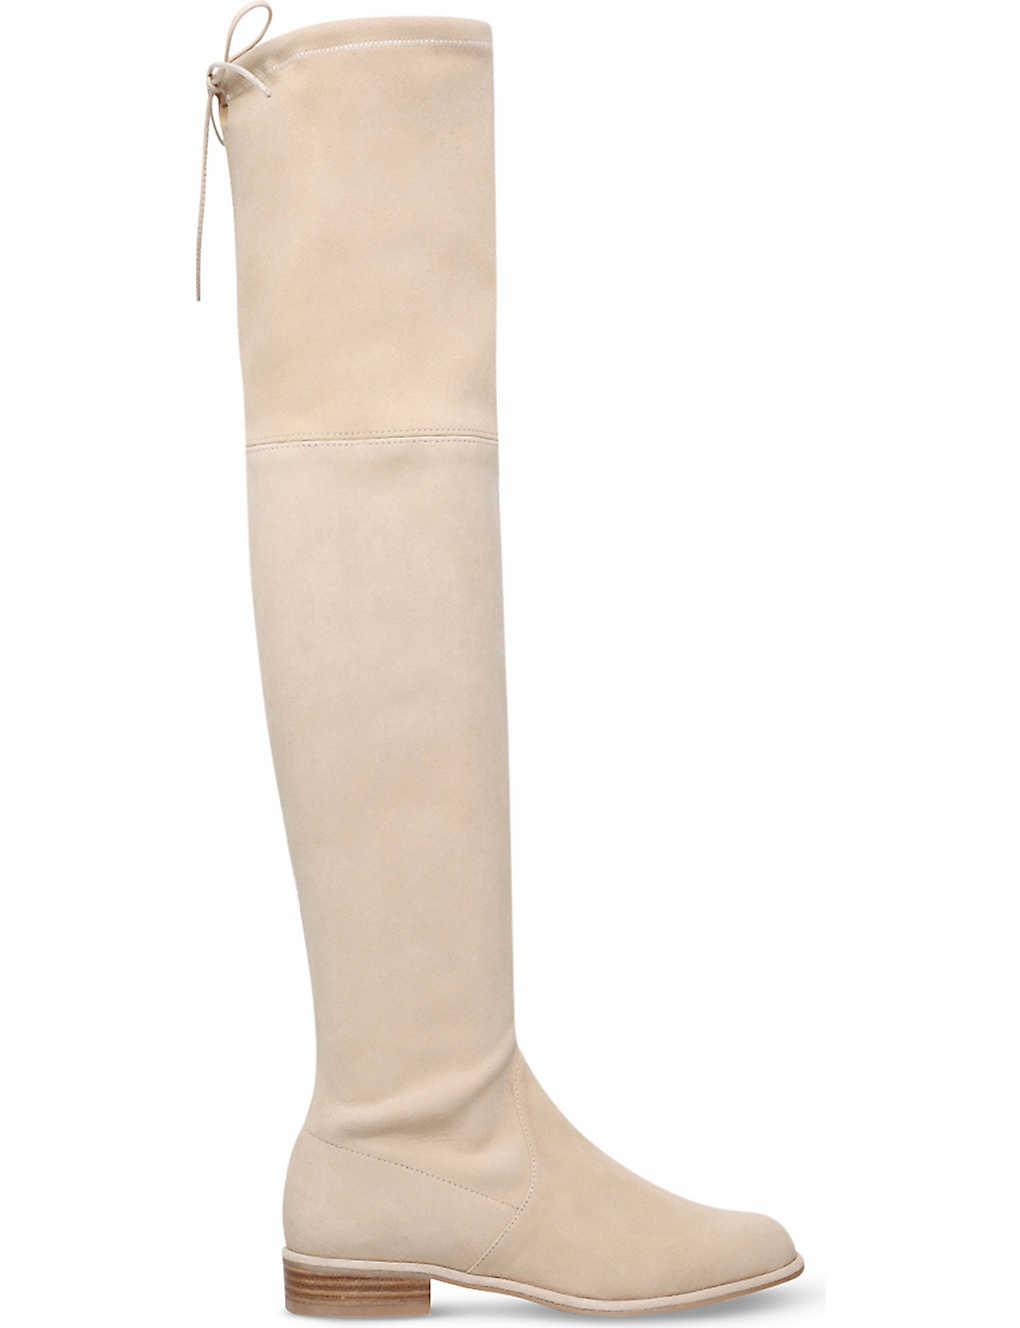 43ecc1c514dd STUART WEITZMAN - Lowland suede thigh-high boots | Selfridges.com